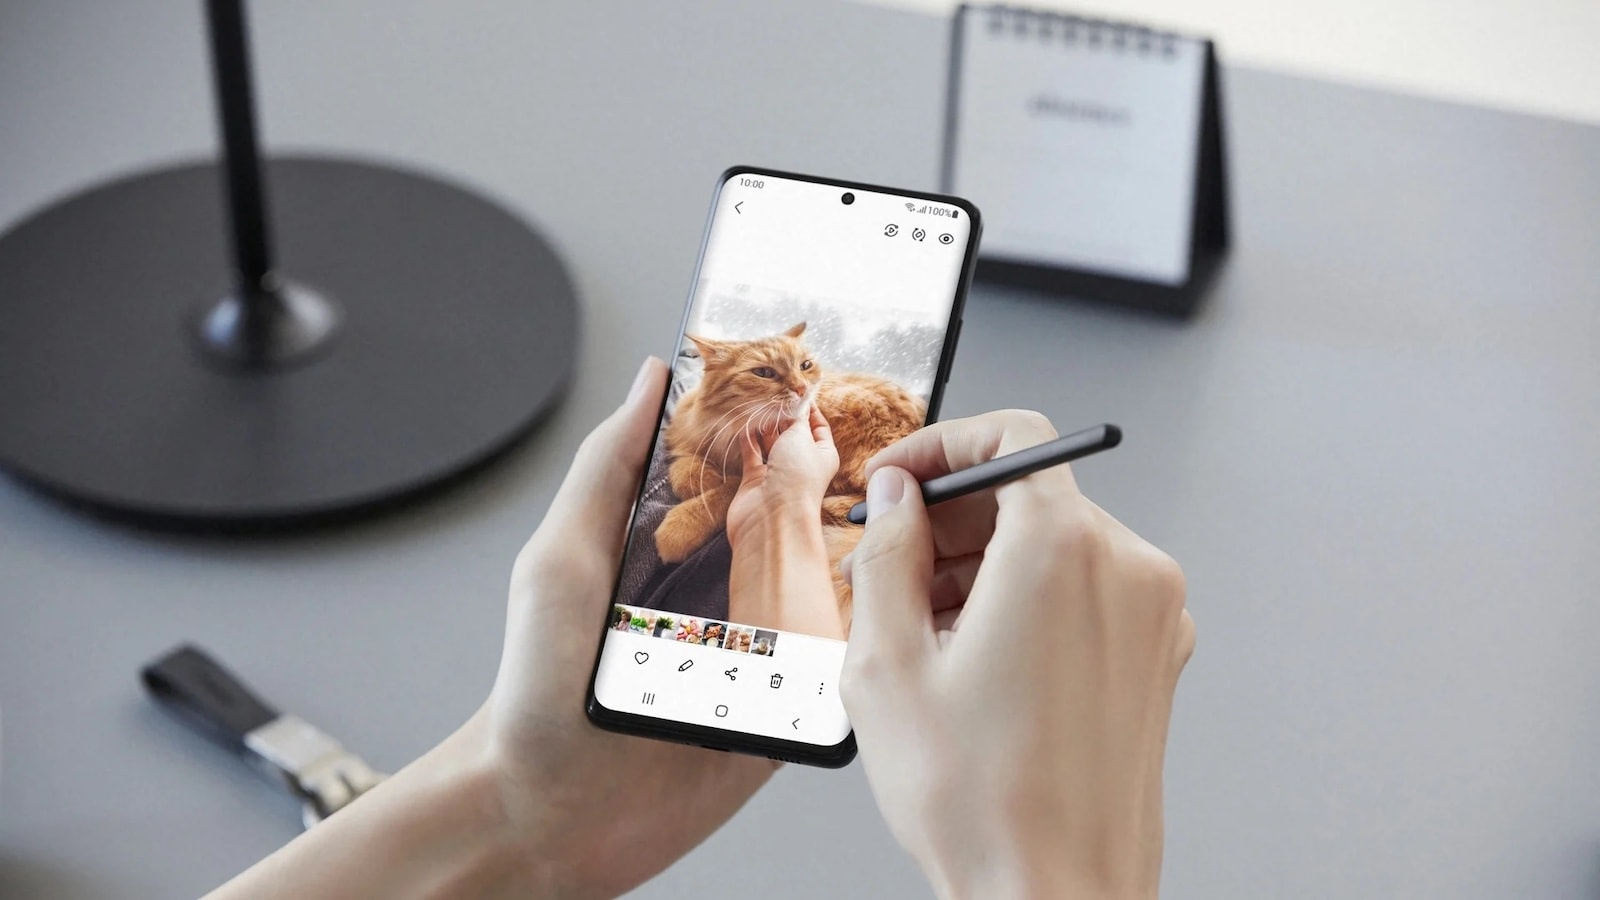 Samsung Galaxy S21 Ultra 5G S-Pen makes writing and sketching feel natural